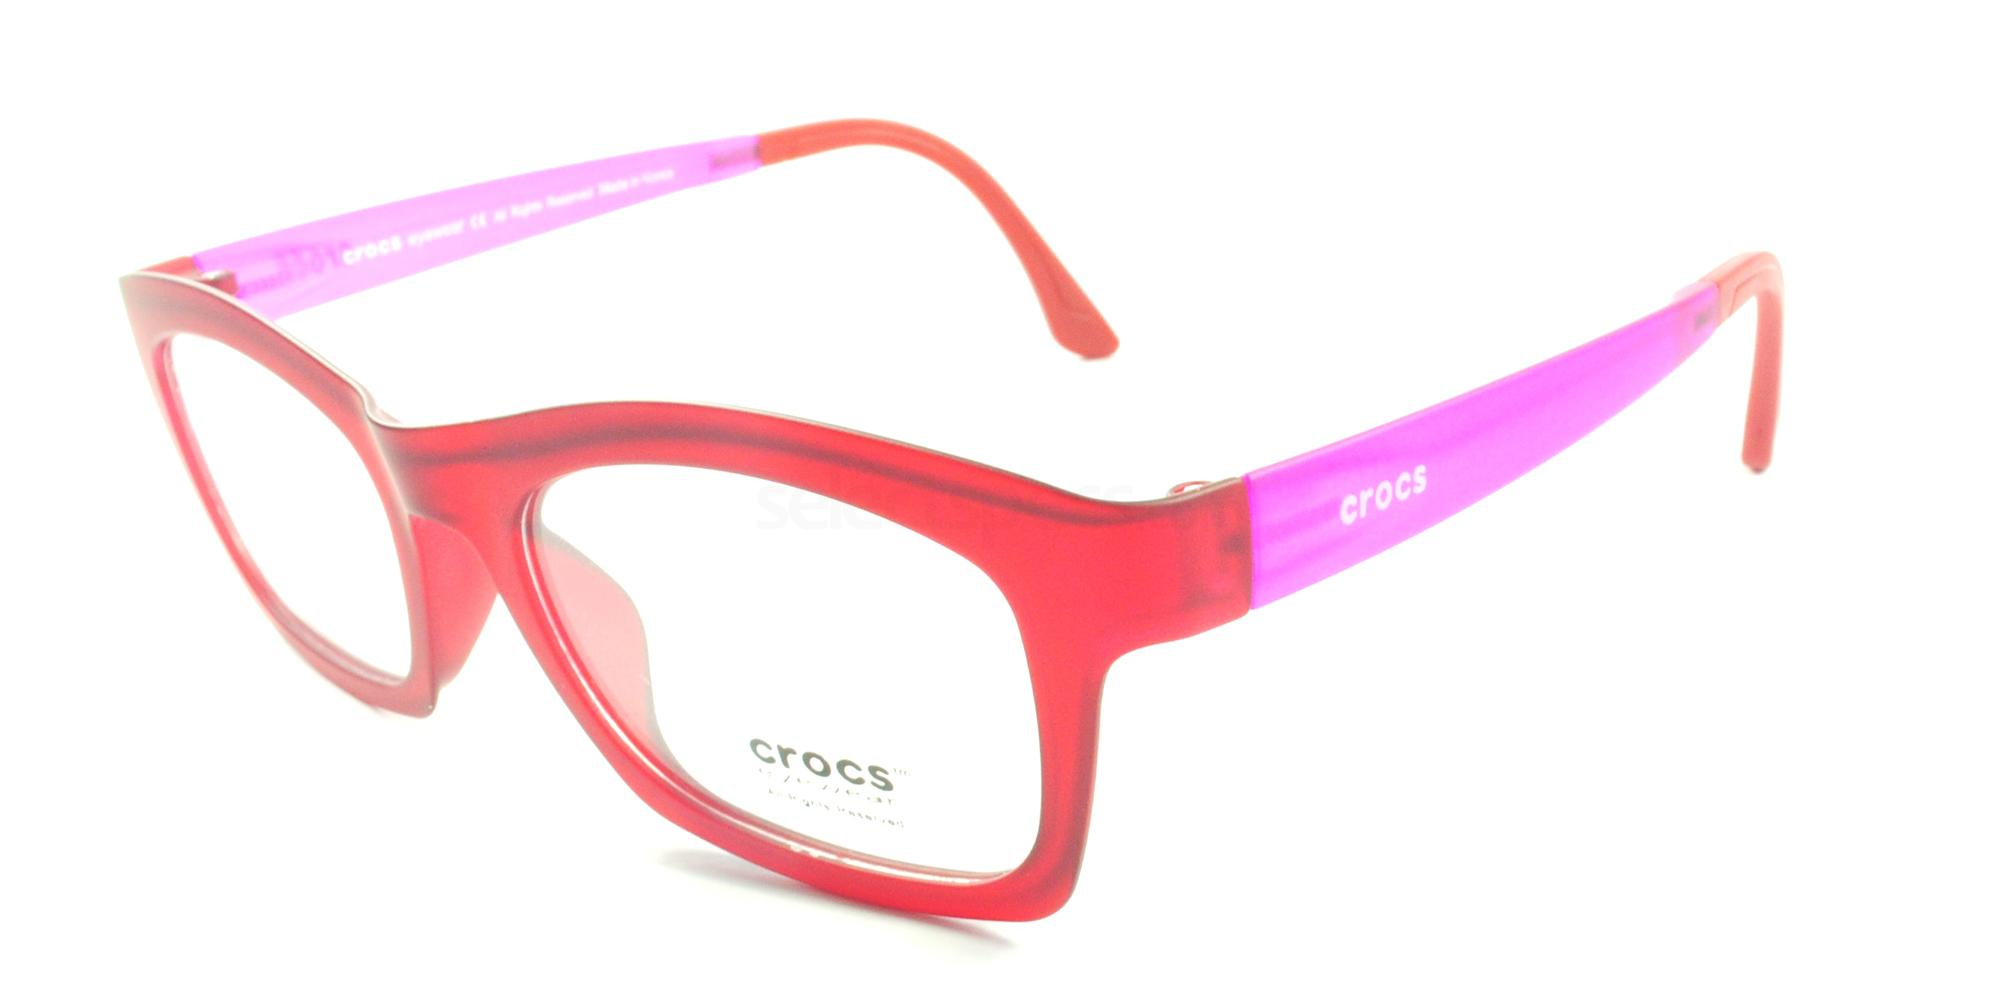 15PK CF629 Glasses, Crocs Eyewear